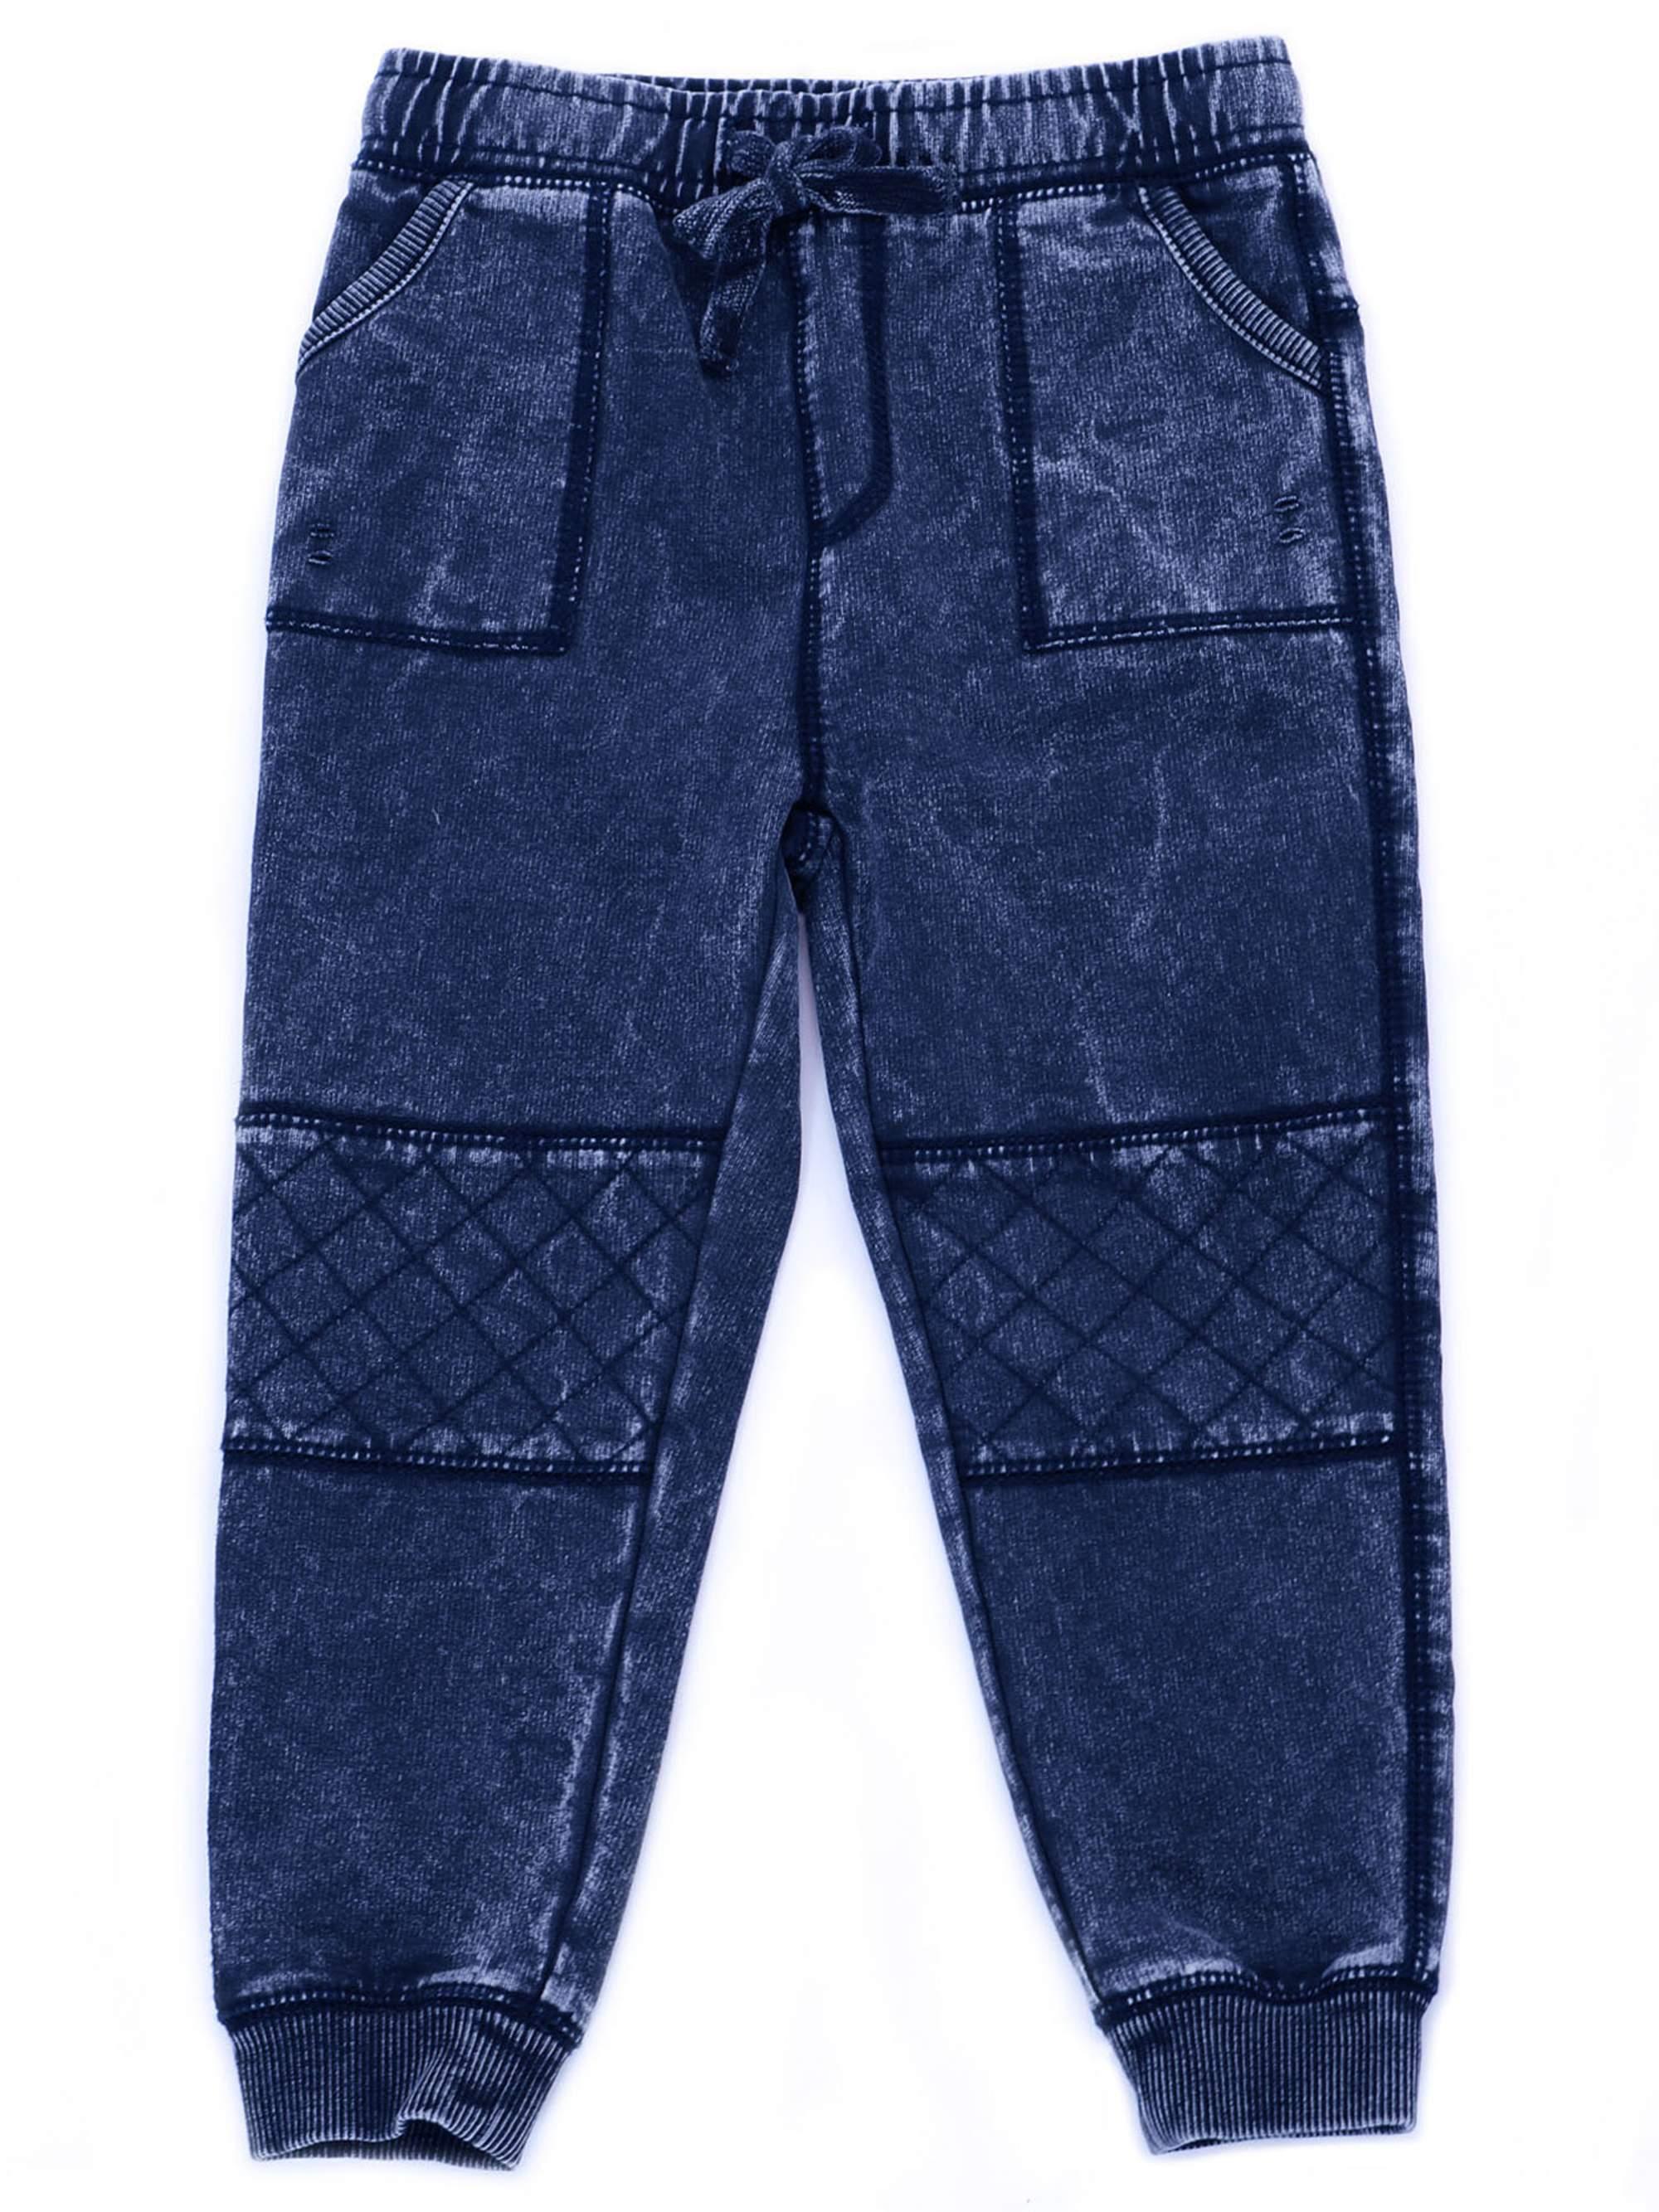 Kapital K Biker Jogger Pants (Baby Boys and Toddler Boys)